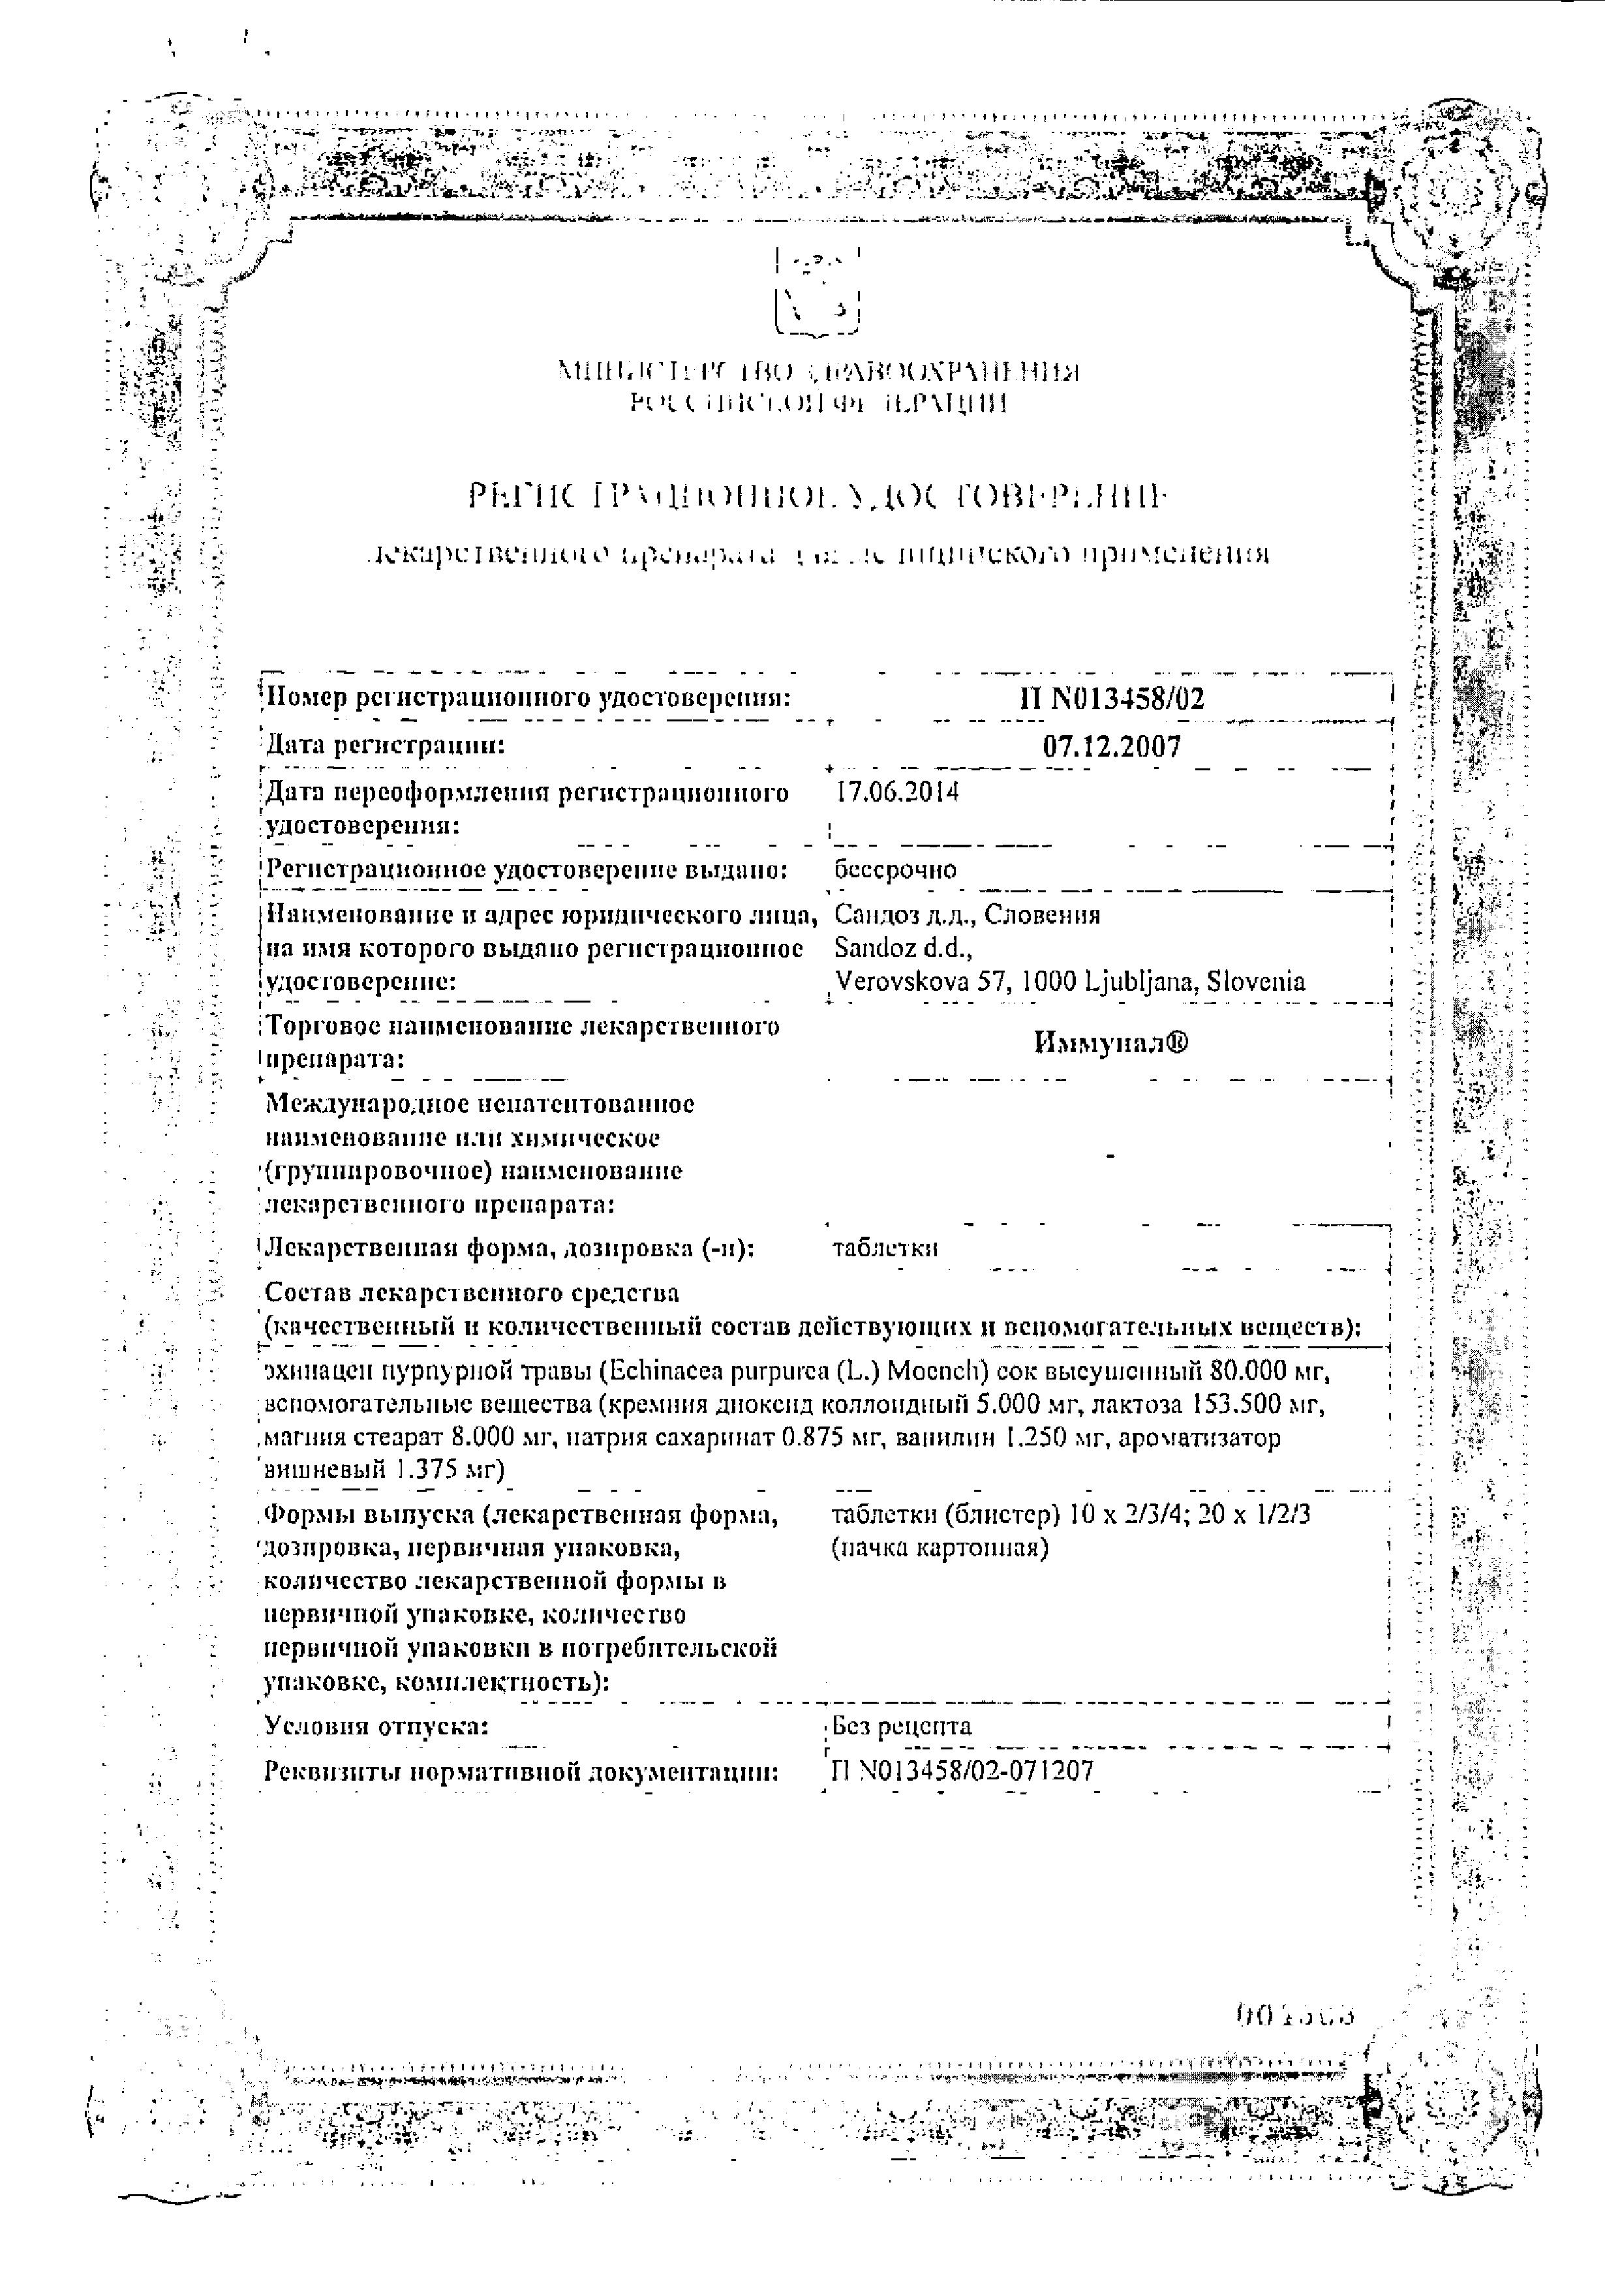 Иммунал сертификат